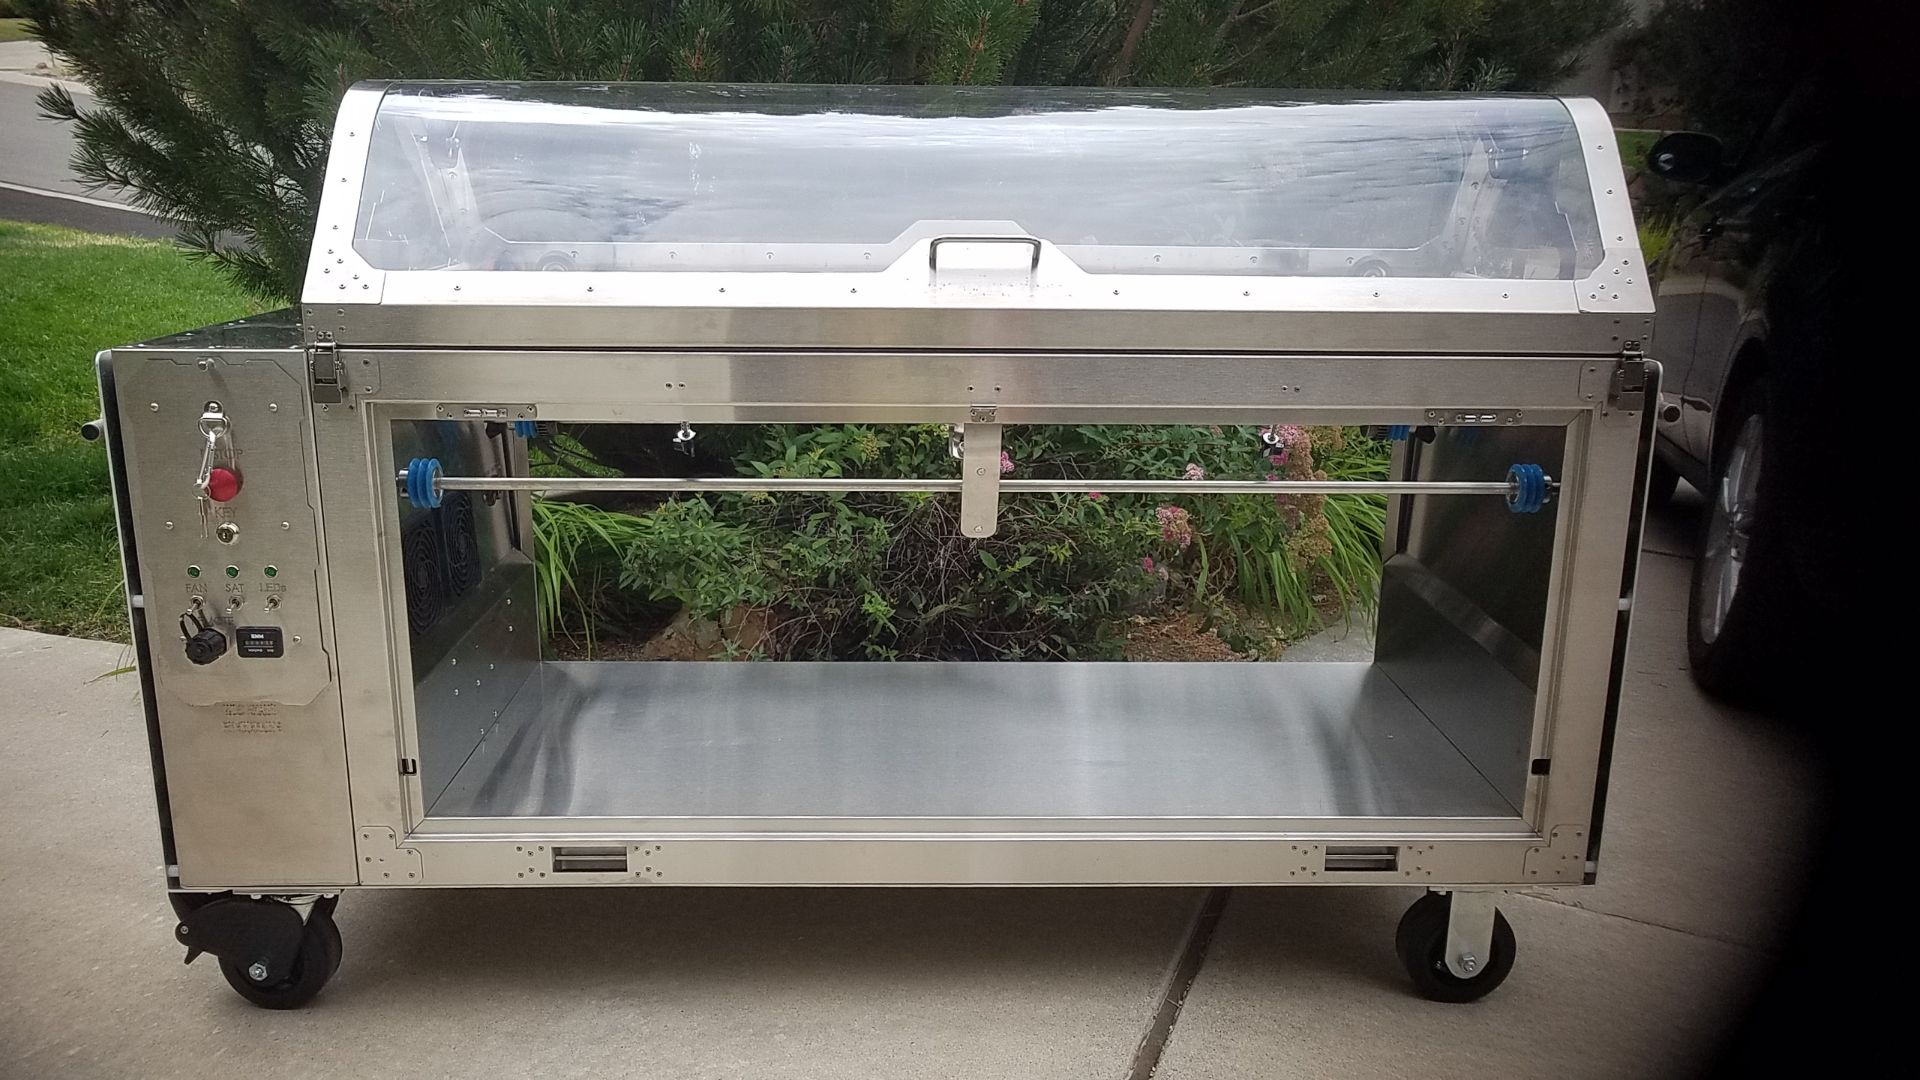 Unused/FactoryNew Revolution Cannabis & Hemp Flower Finisher System Model RDF 4300.100-200 lbs/8 hrs - Image 14 of 32